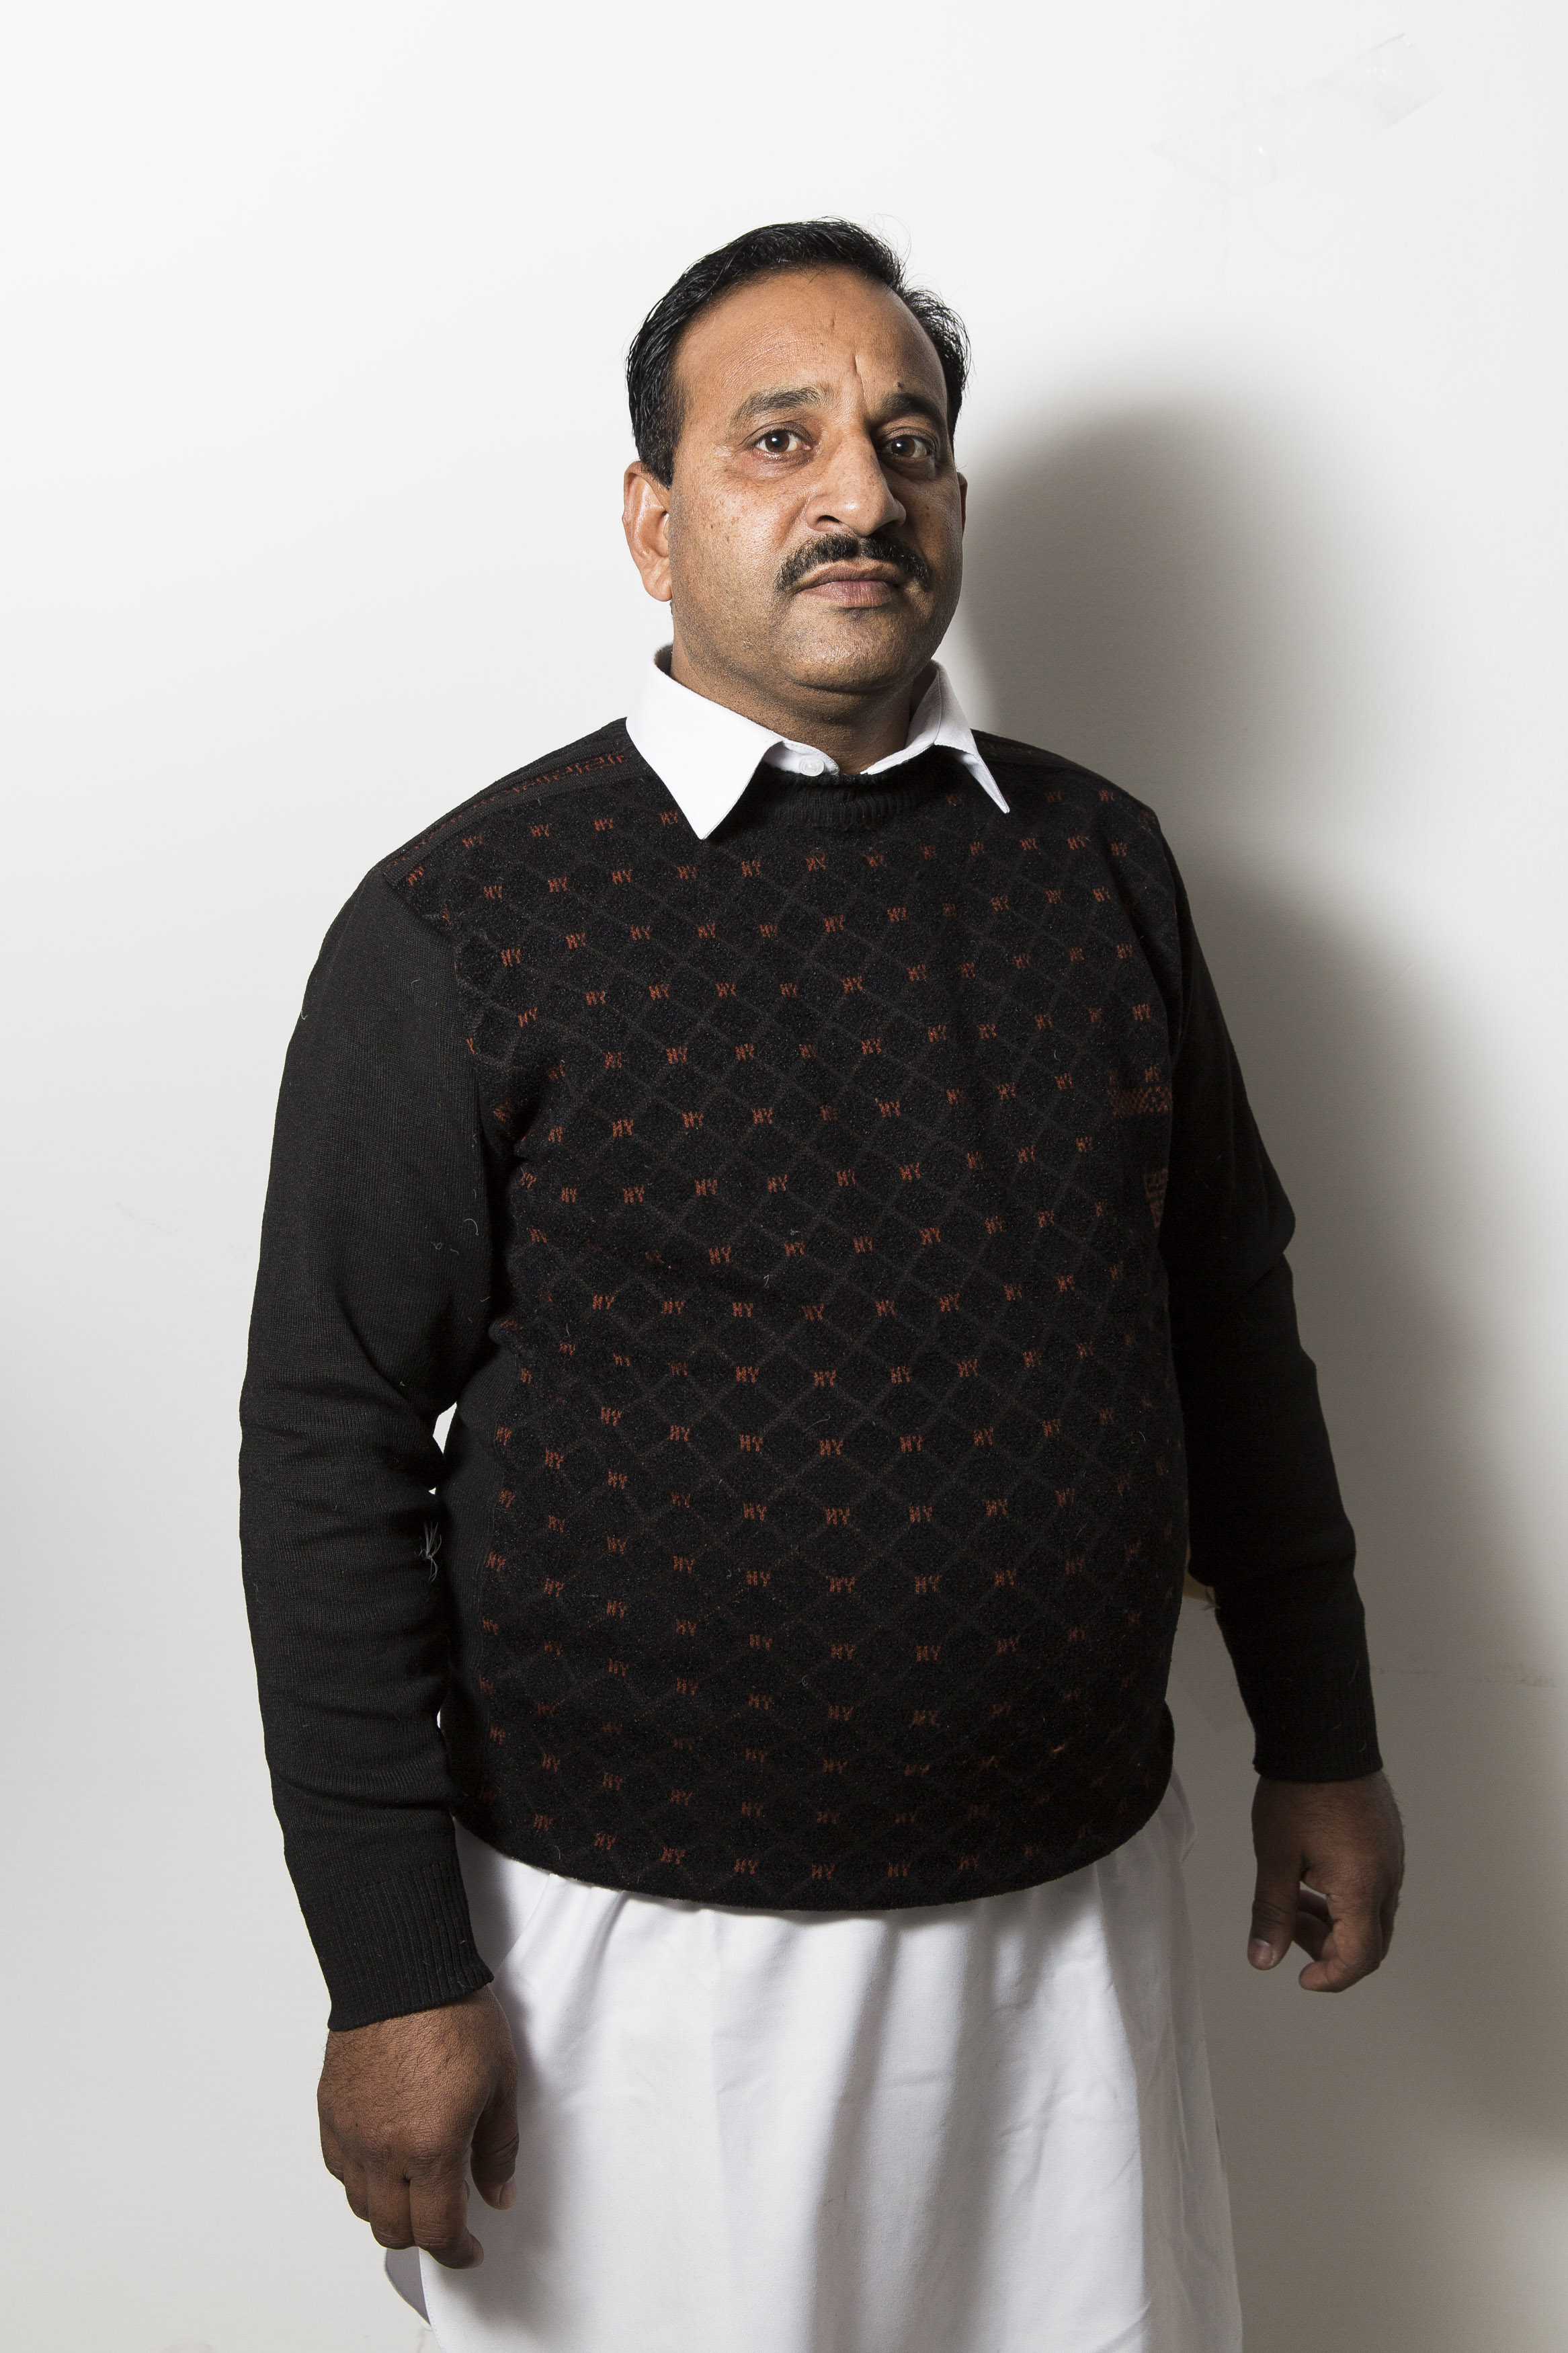 Sajjad Ahmed, 45 anni, operaio stagionale Fada (foto Carlo Ramerino)